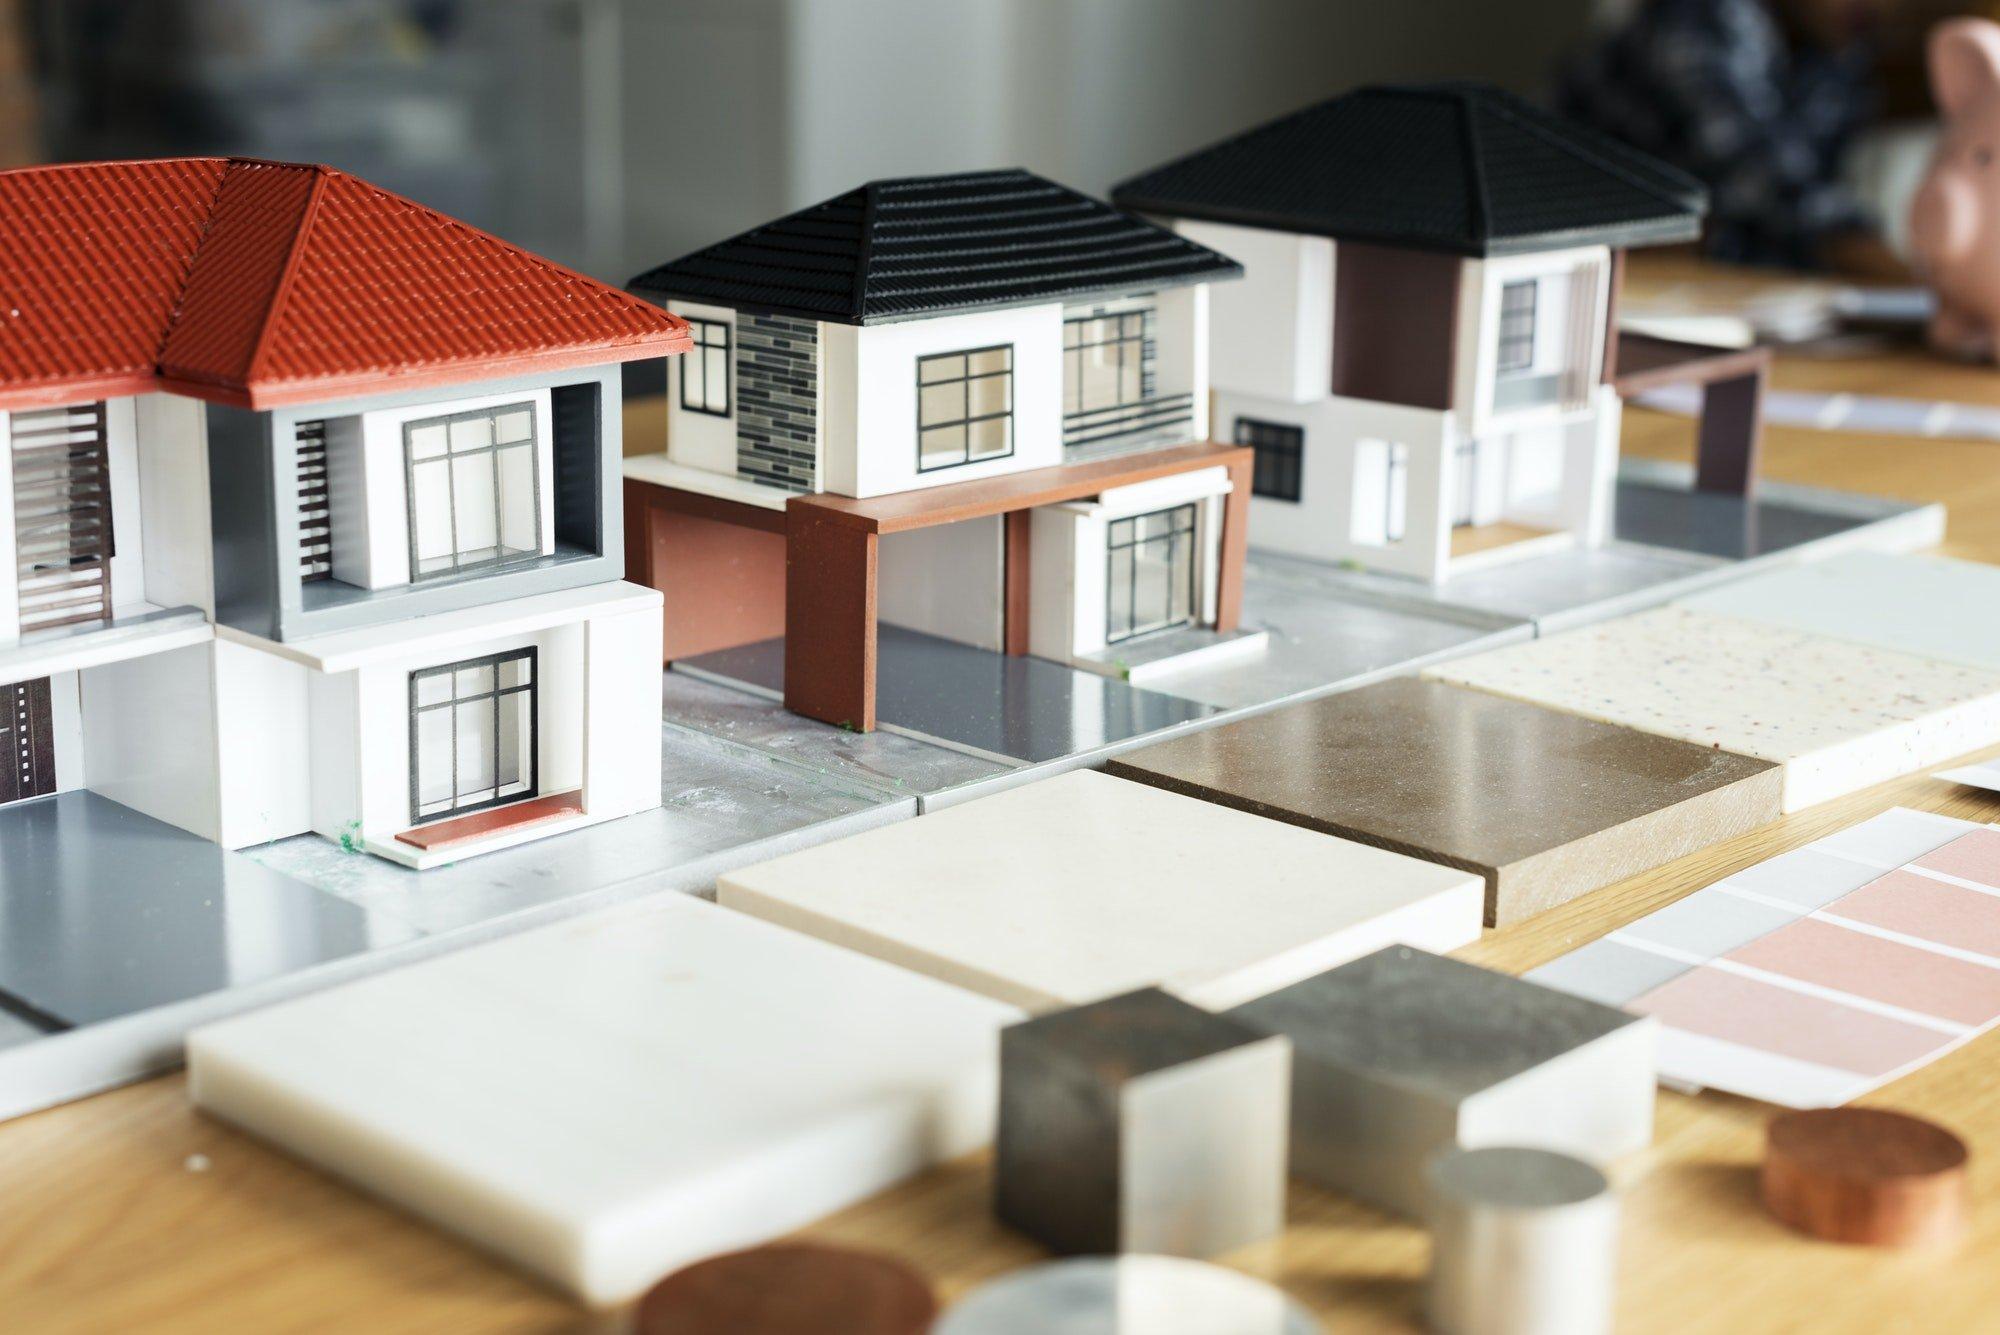 Proyectos Reformas Las Palmas House models